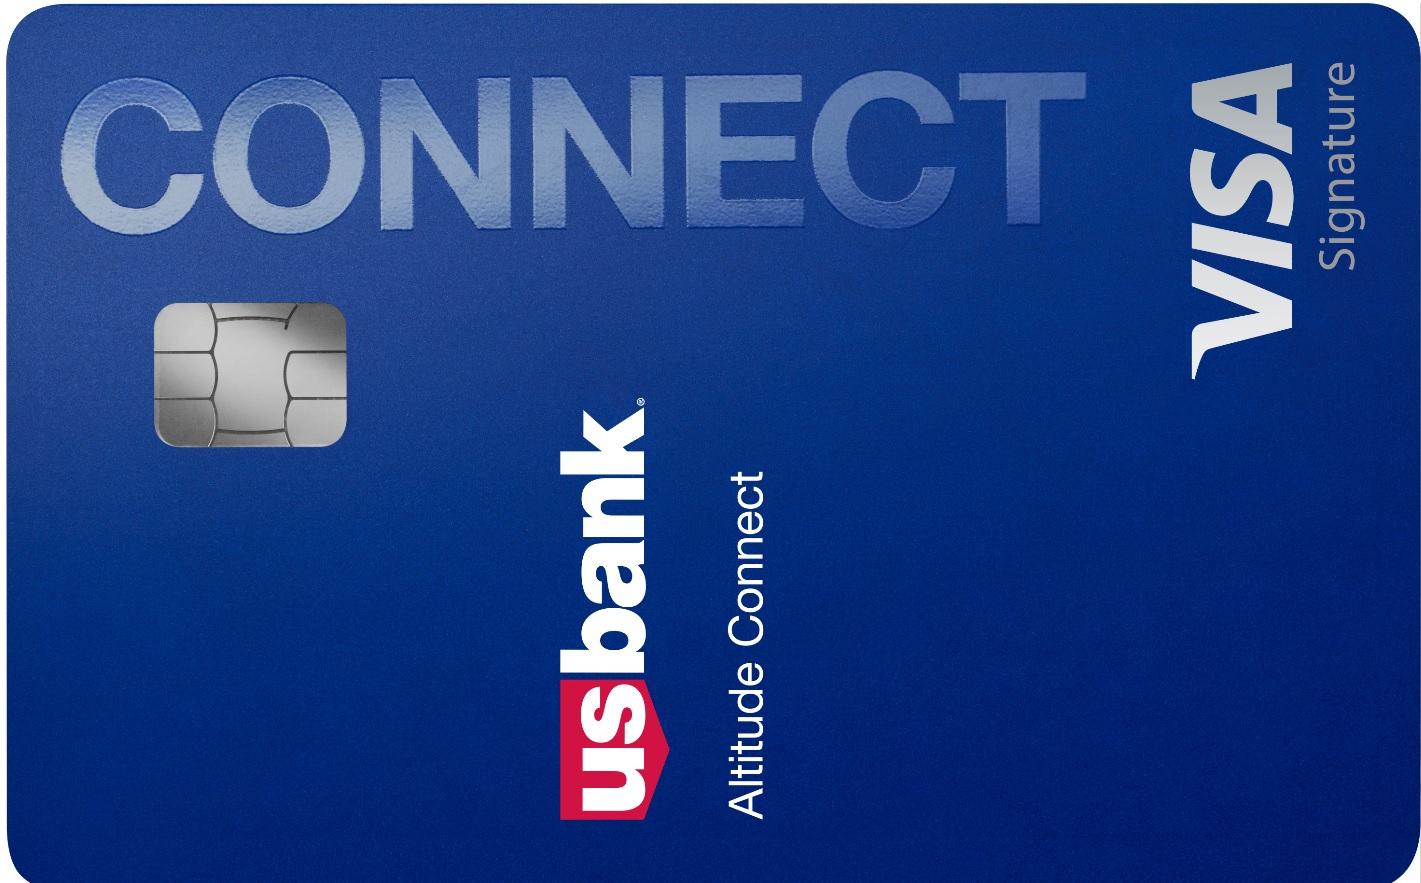 US Bank Altitude Connect Visa Signature Card